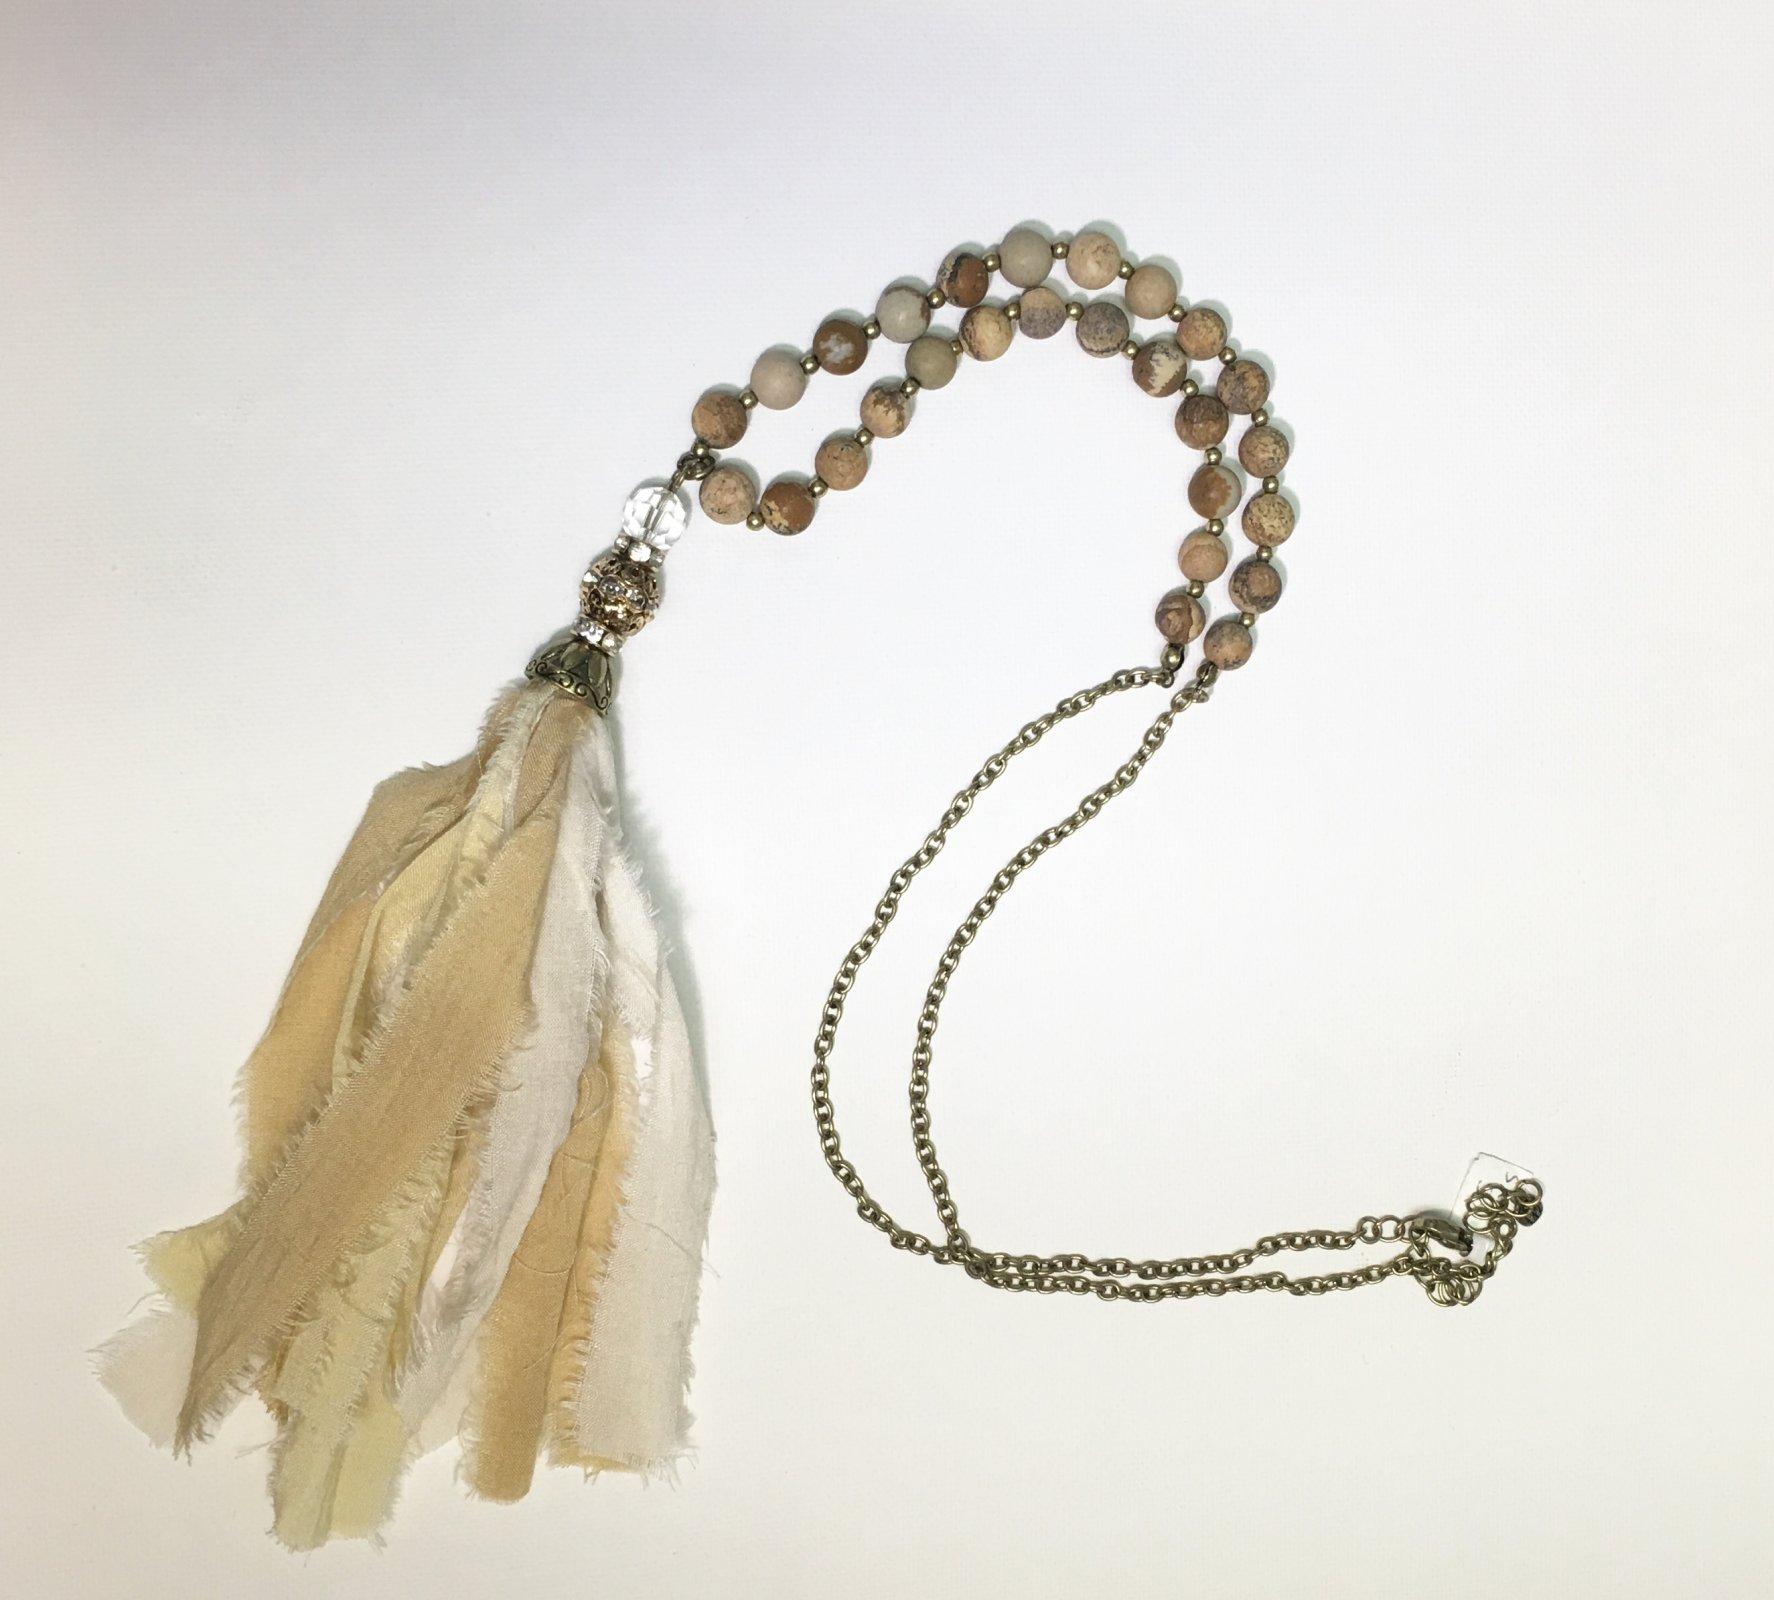 Beige Tassel with Beige Beads 0036